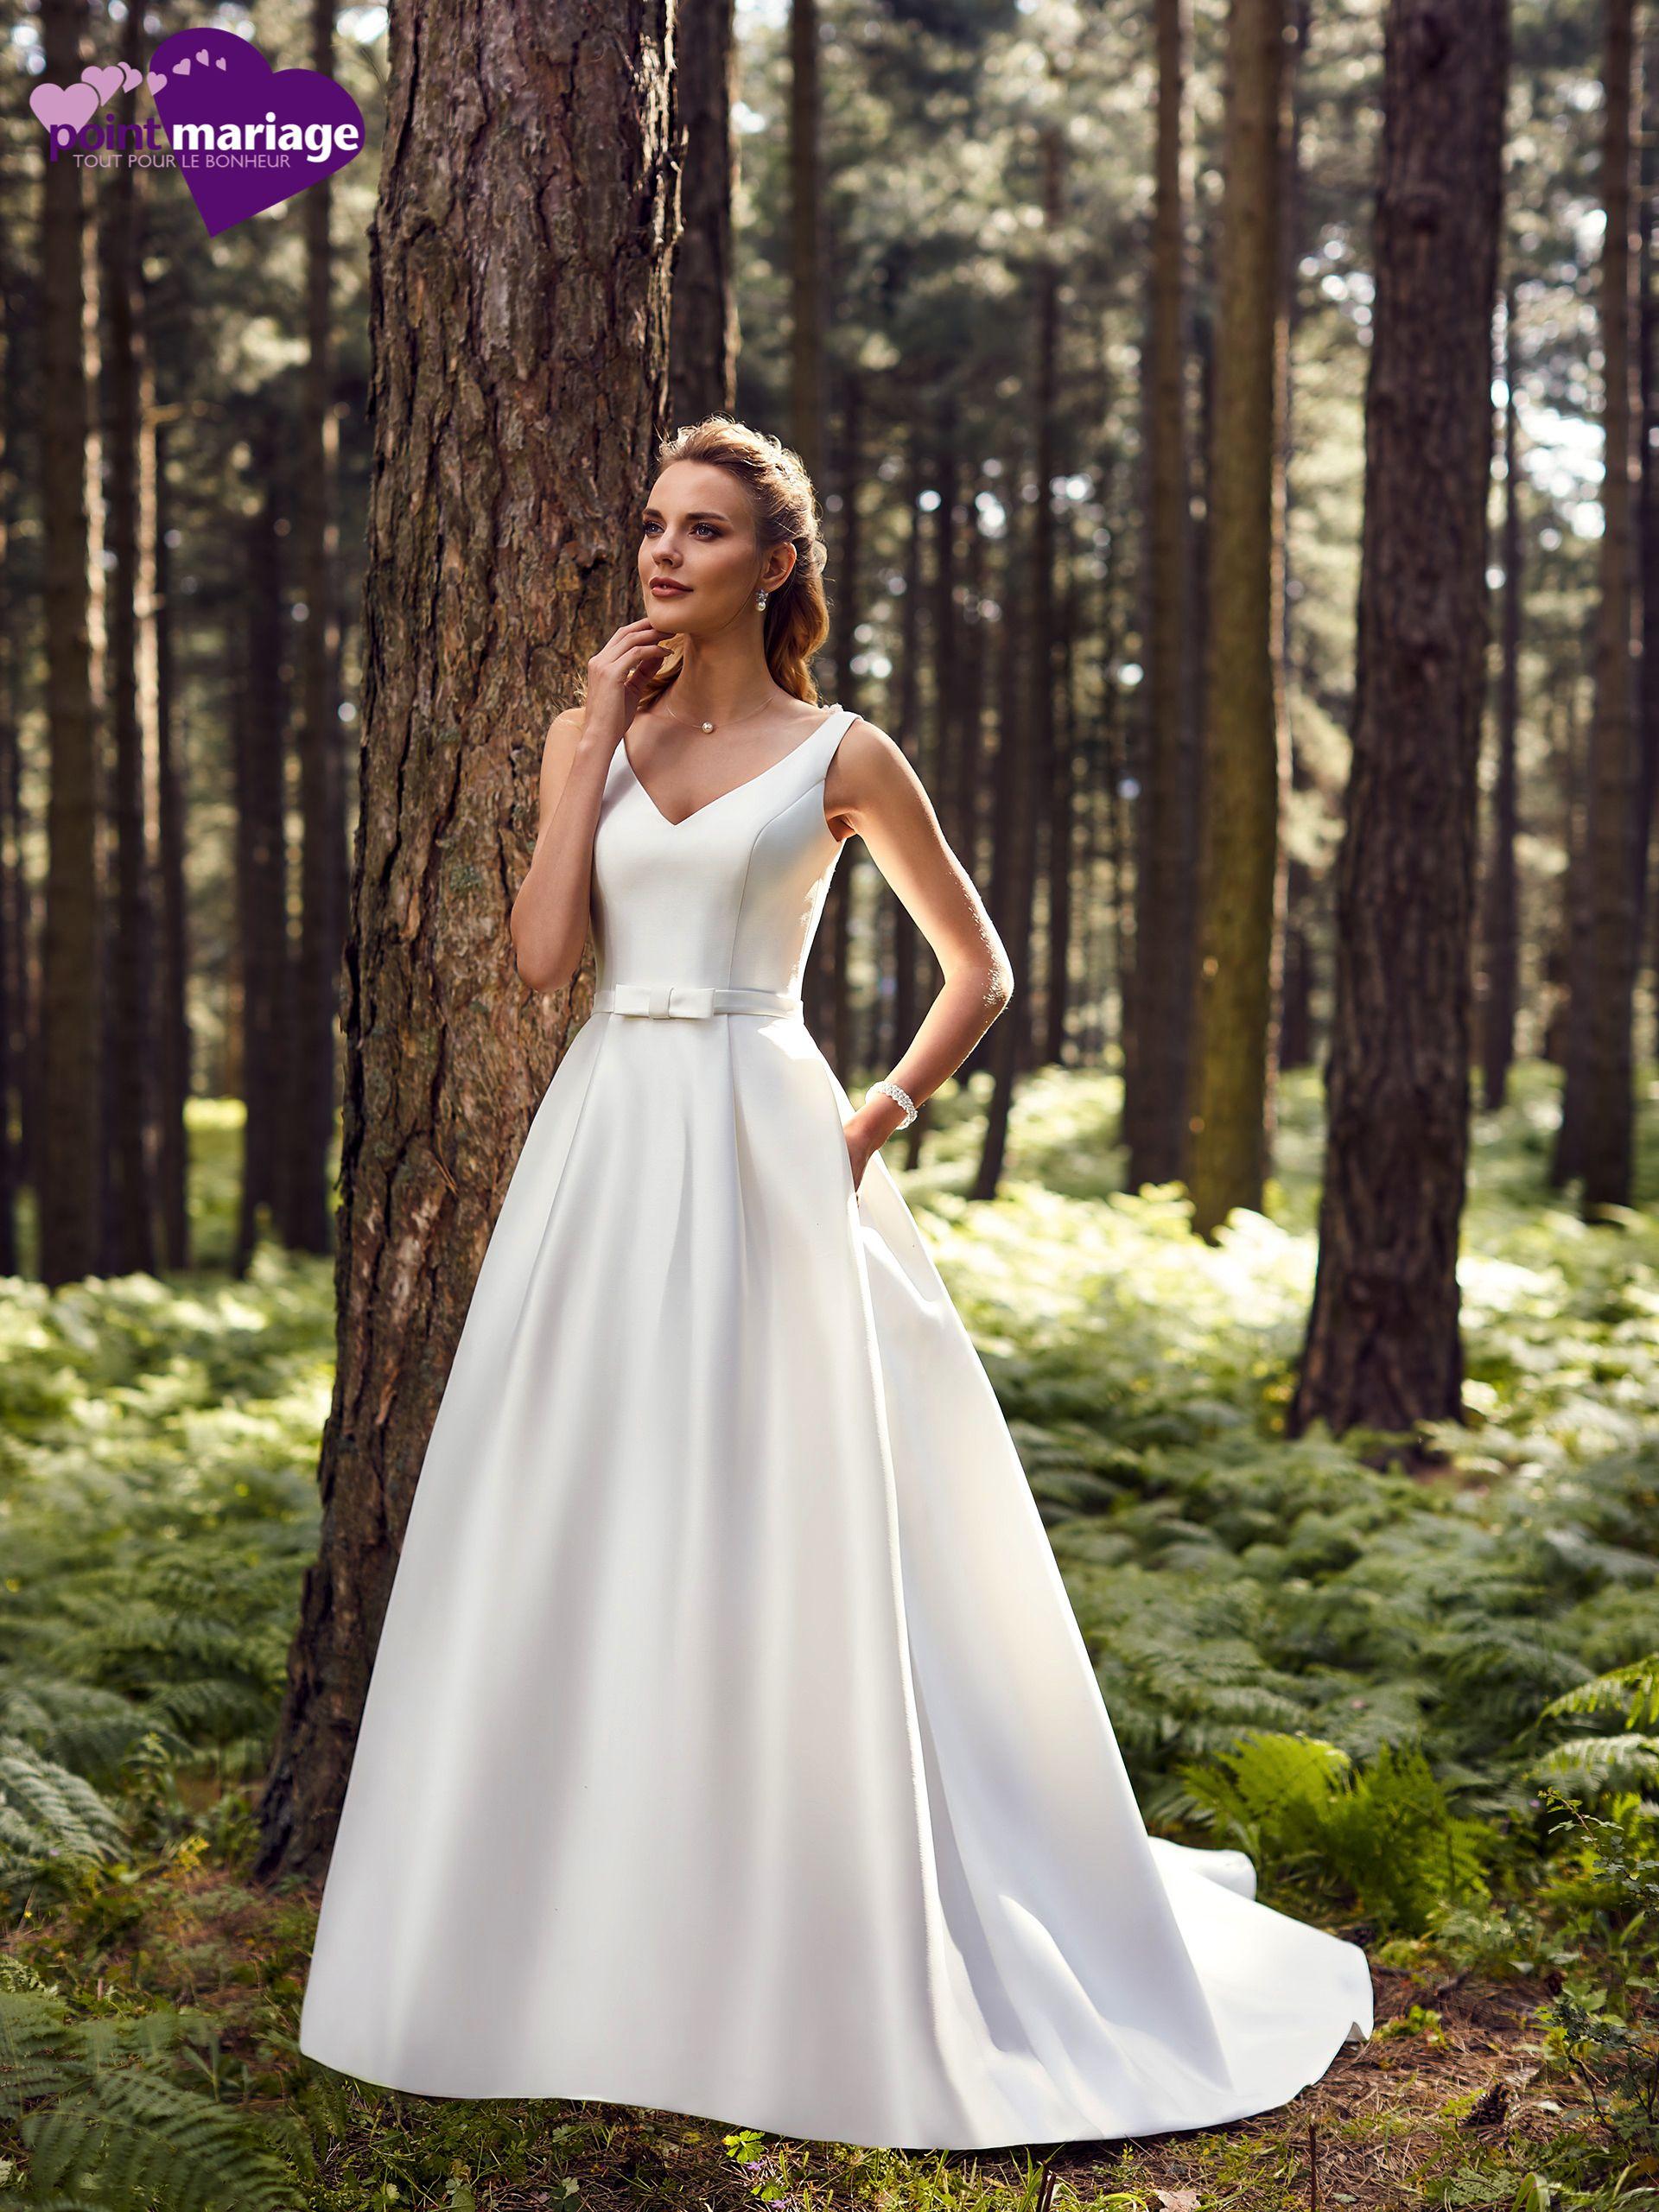 Robe de mariée Versaille, robe de mariée